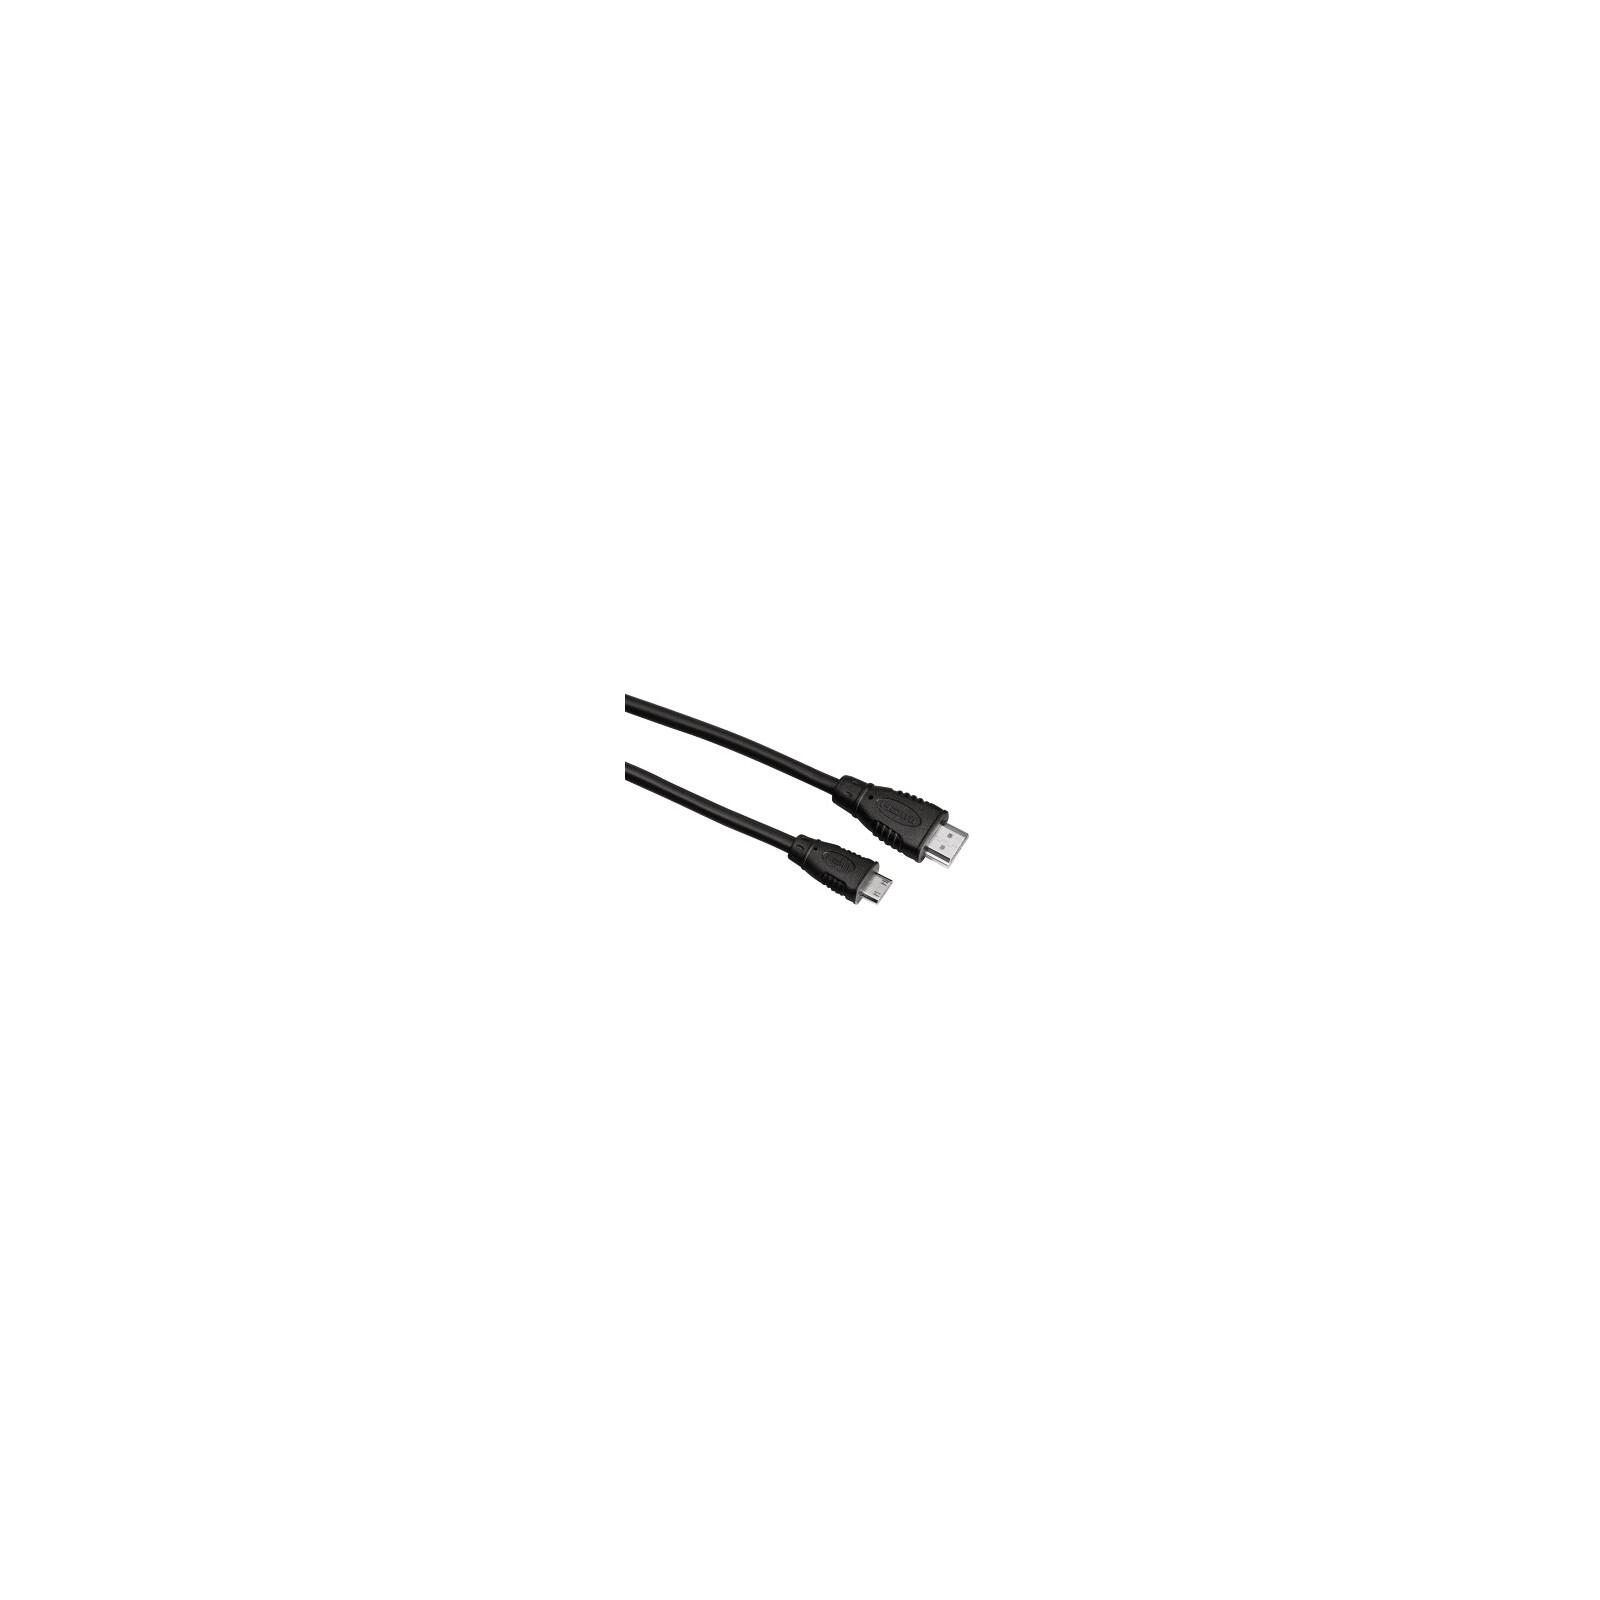 Hama 74243 HDMI Mini A/C 1,5m